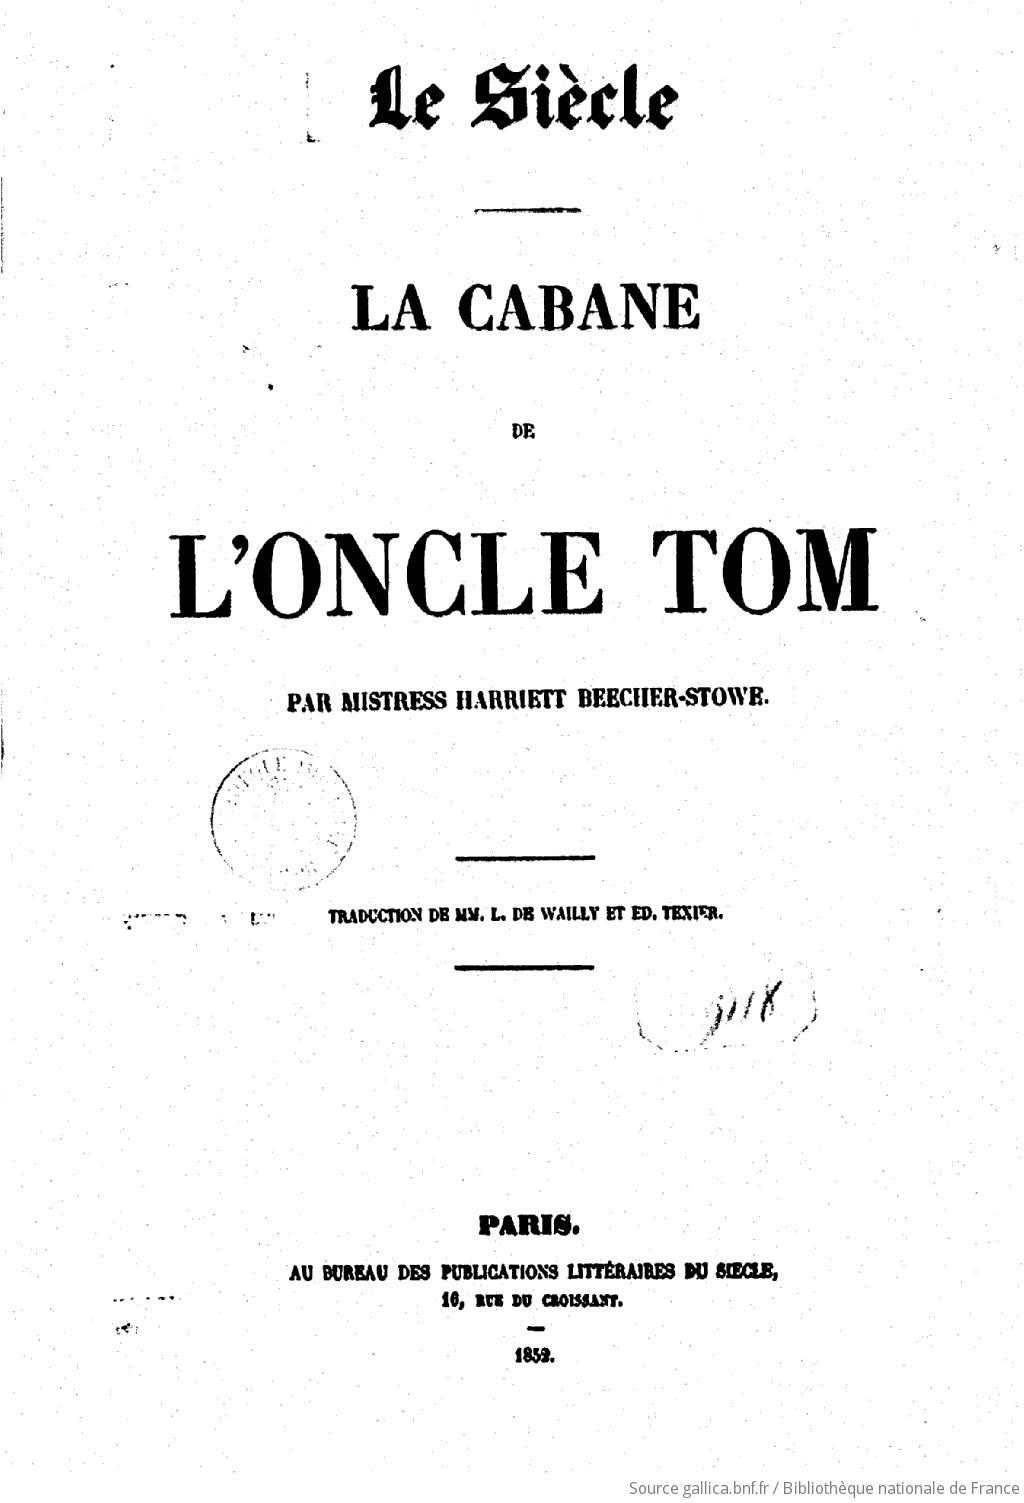 http://gallica.bnf.fr/ark:/12148/bpt6k5817466h/f8.highres